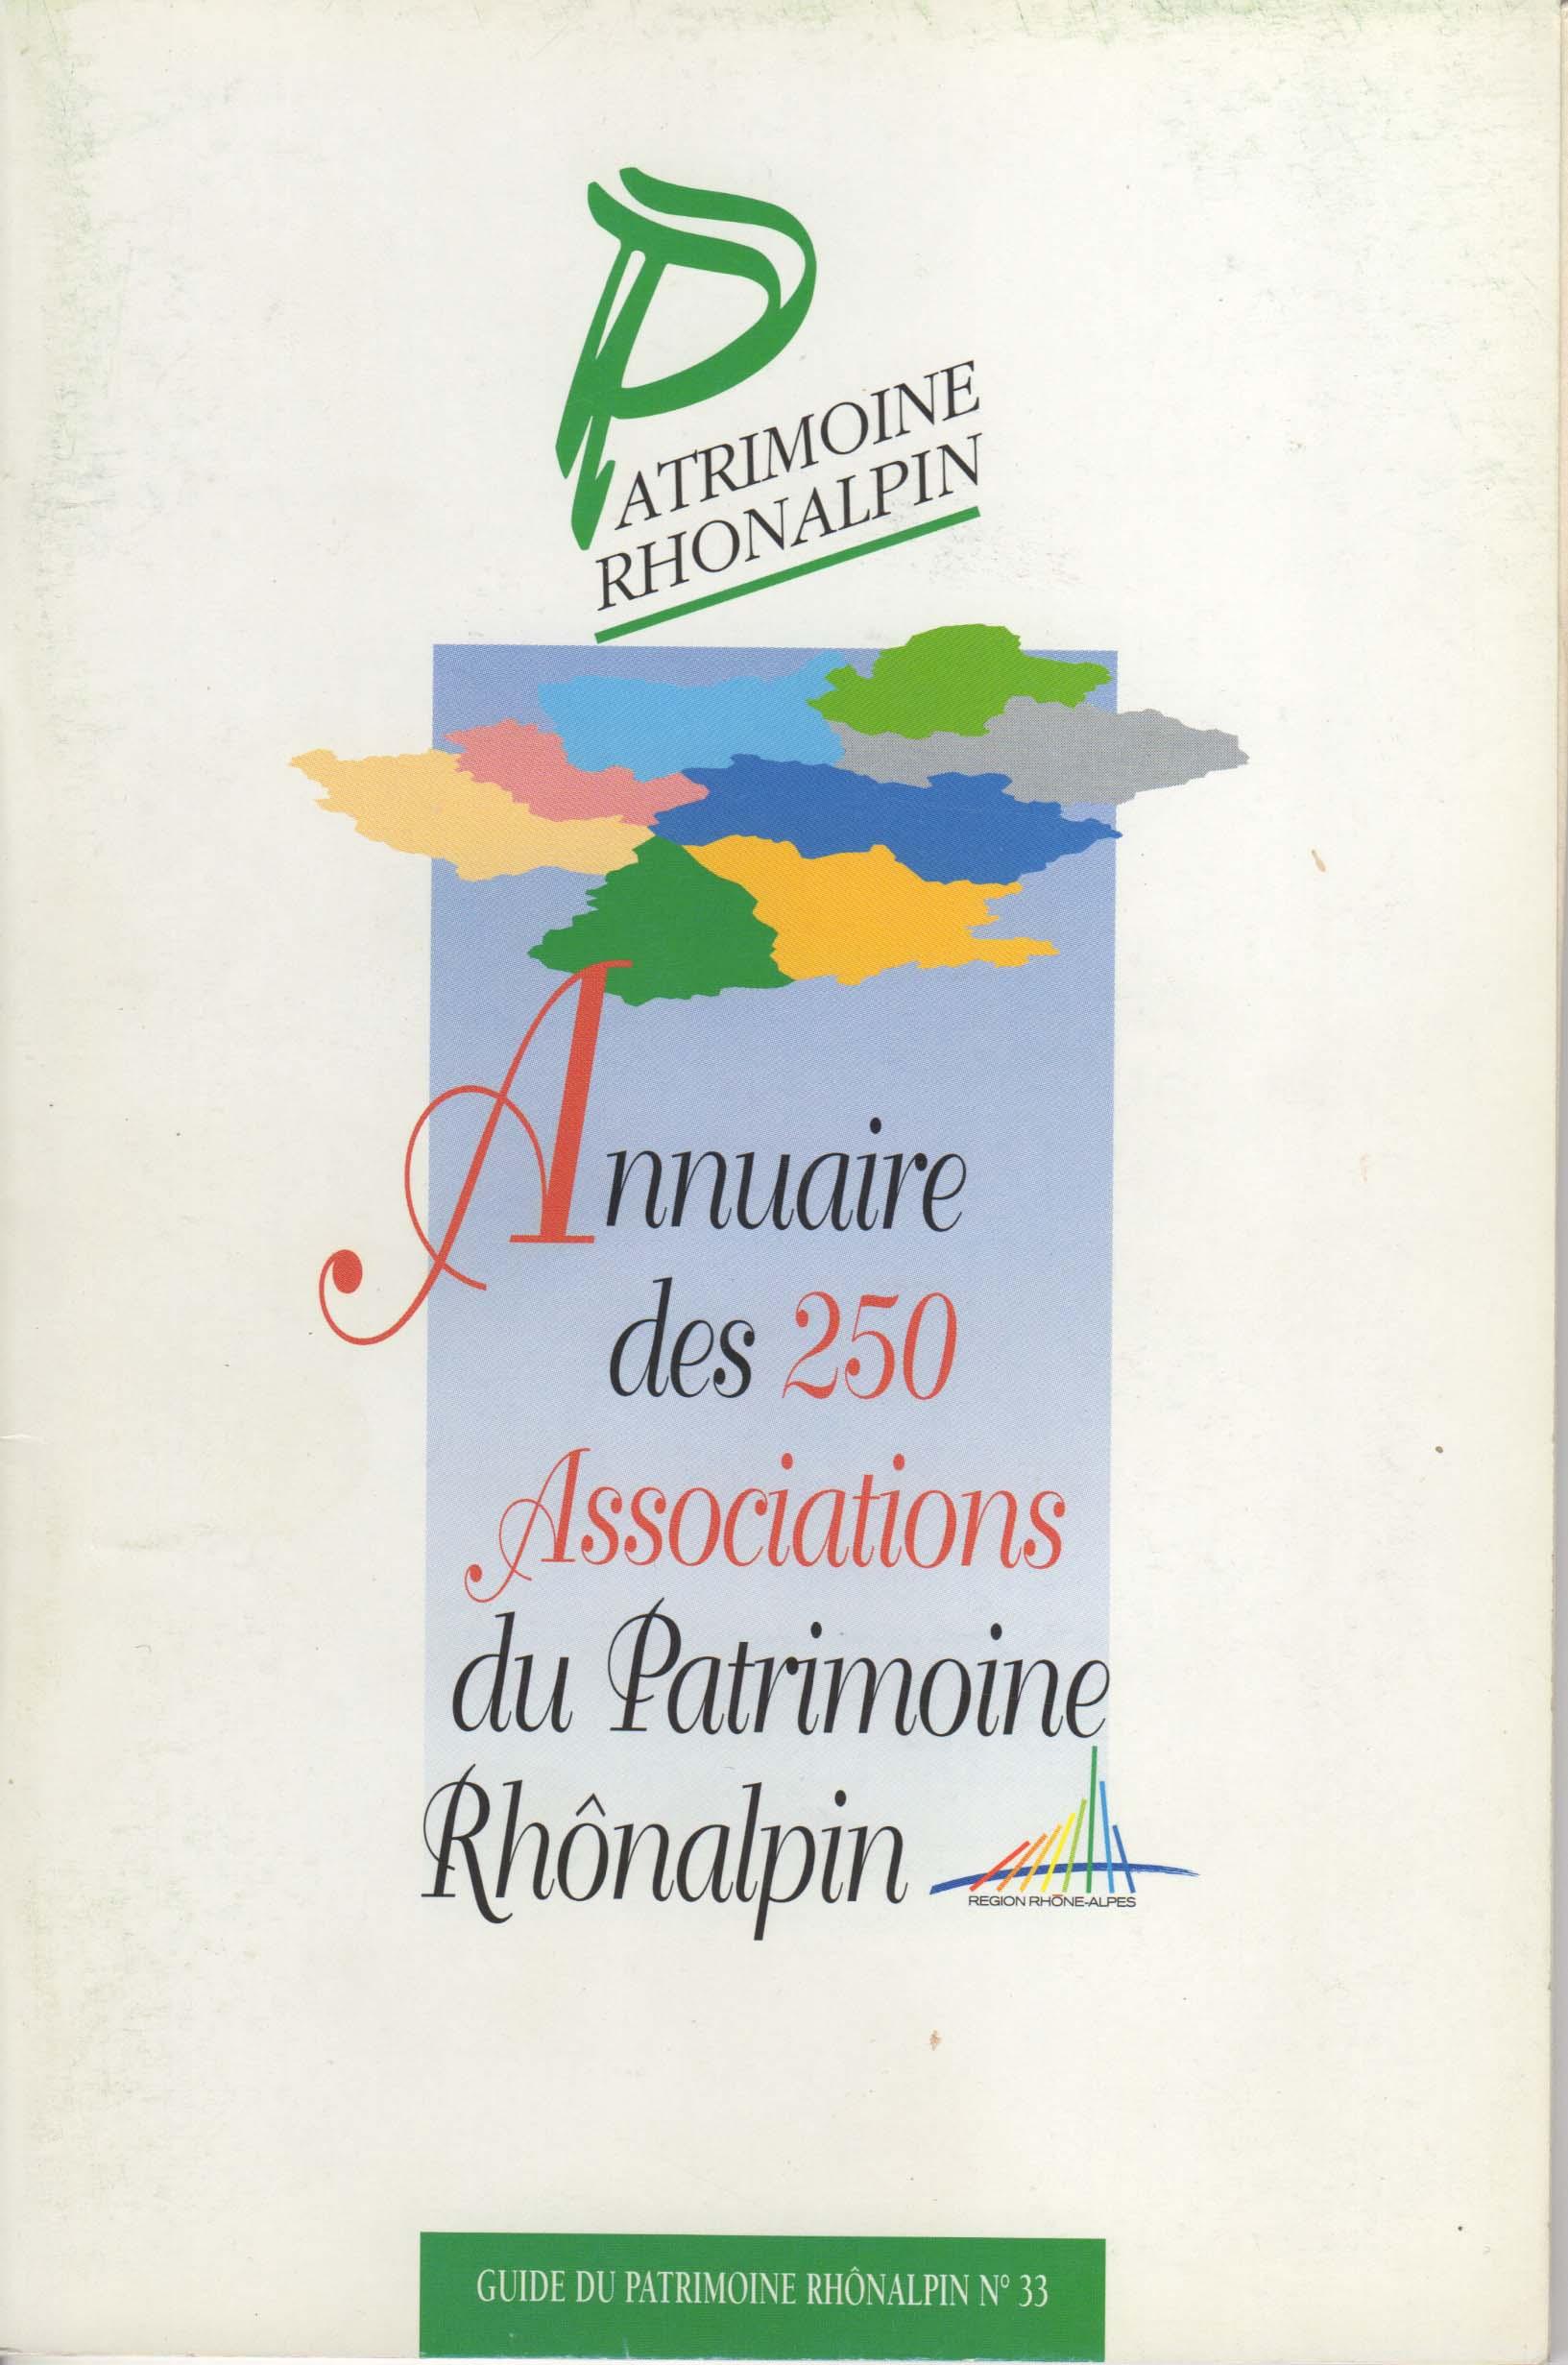 Guide n°33 – Annuaire des 250 associations du patrimoine rhônalpin